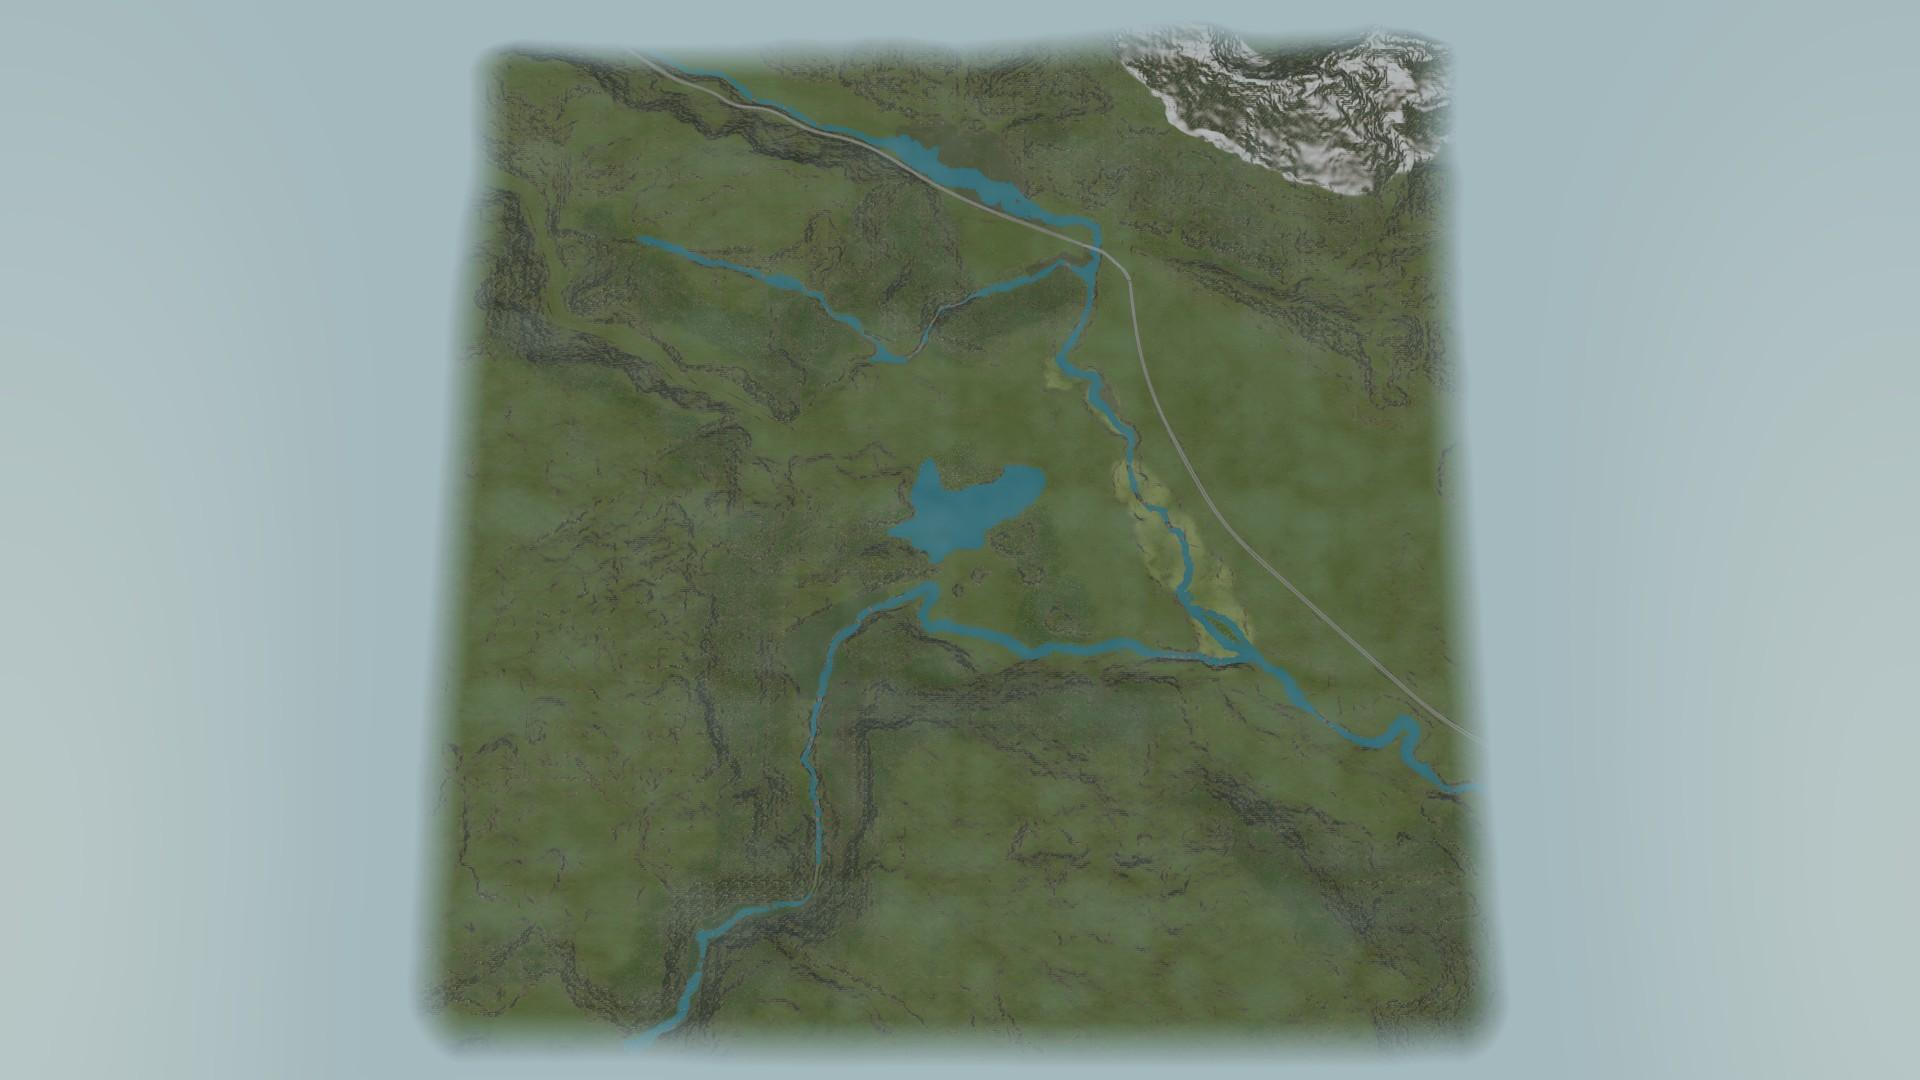 [MAP] Disponible : Blejsko jezero 654C2A66A9FBD7A8267E3143E0BFF6BF30F69BAE